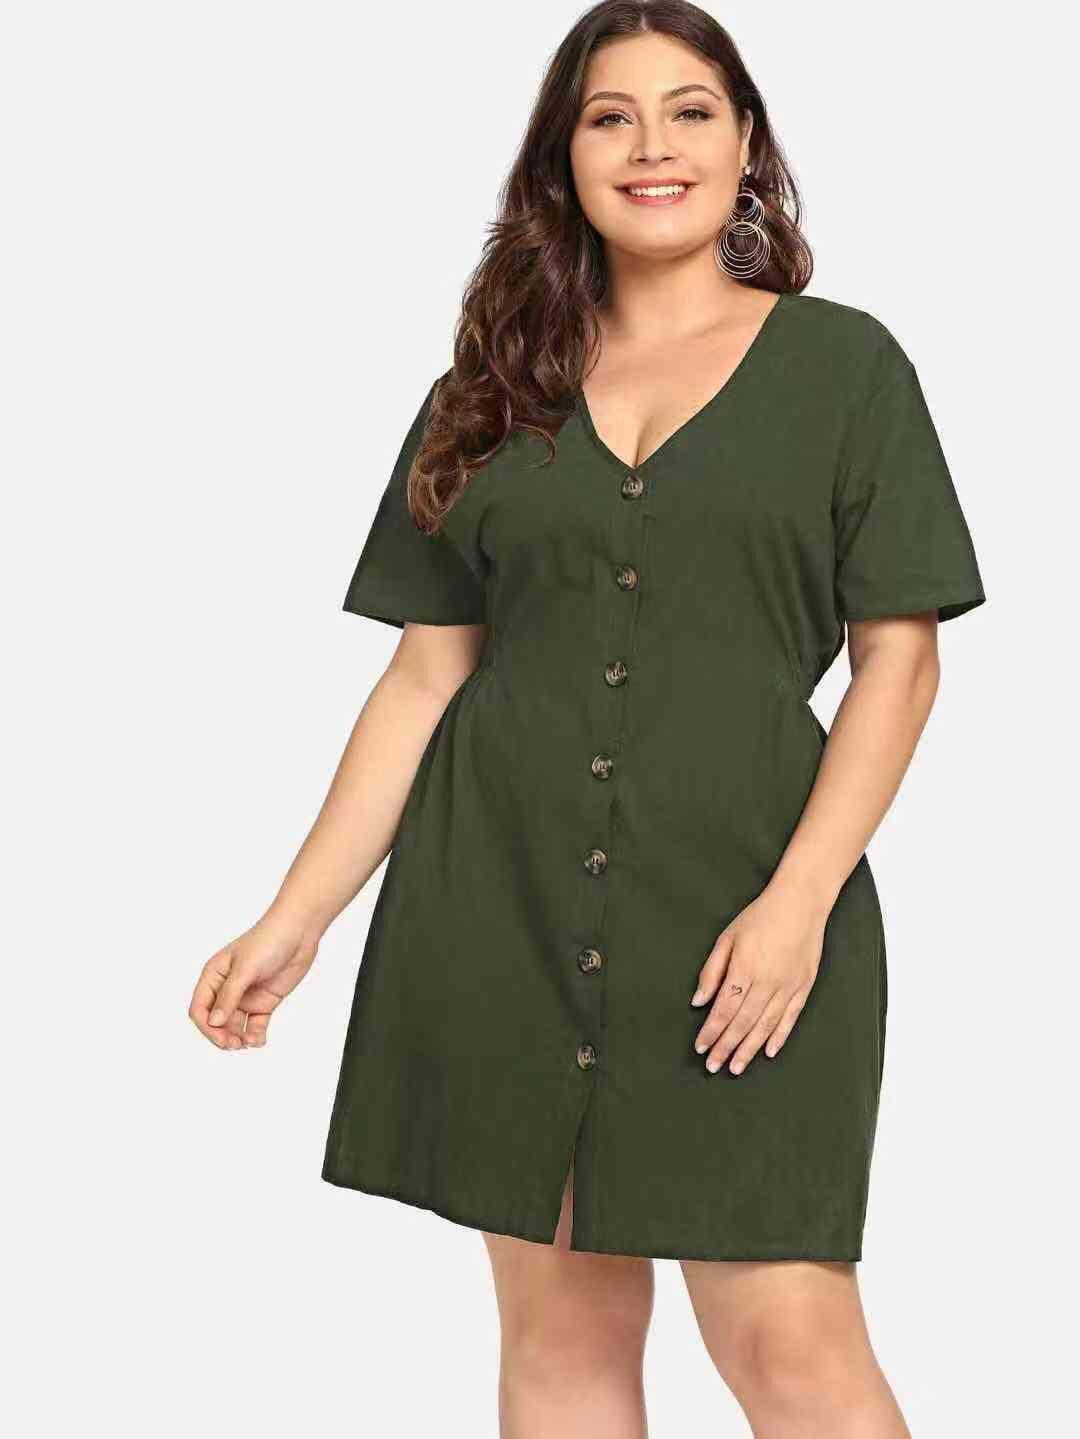 daa45d39b4 Fashion Dresses for sale - Dress for Women online brands